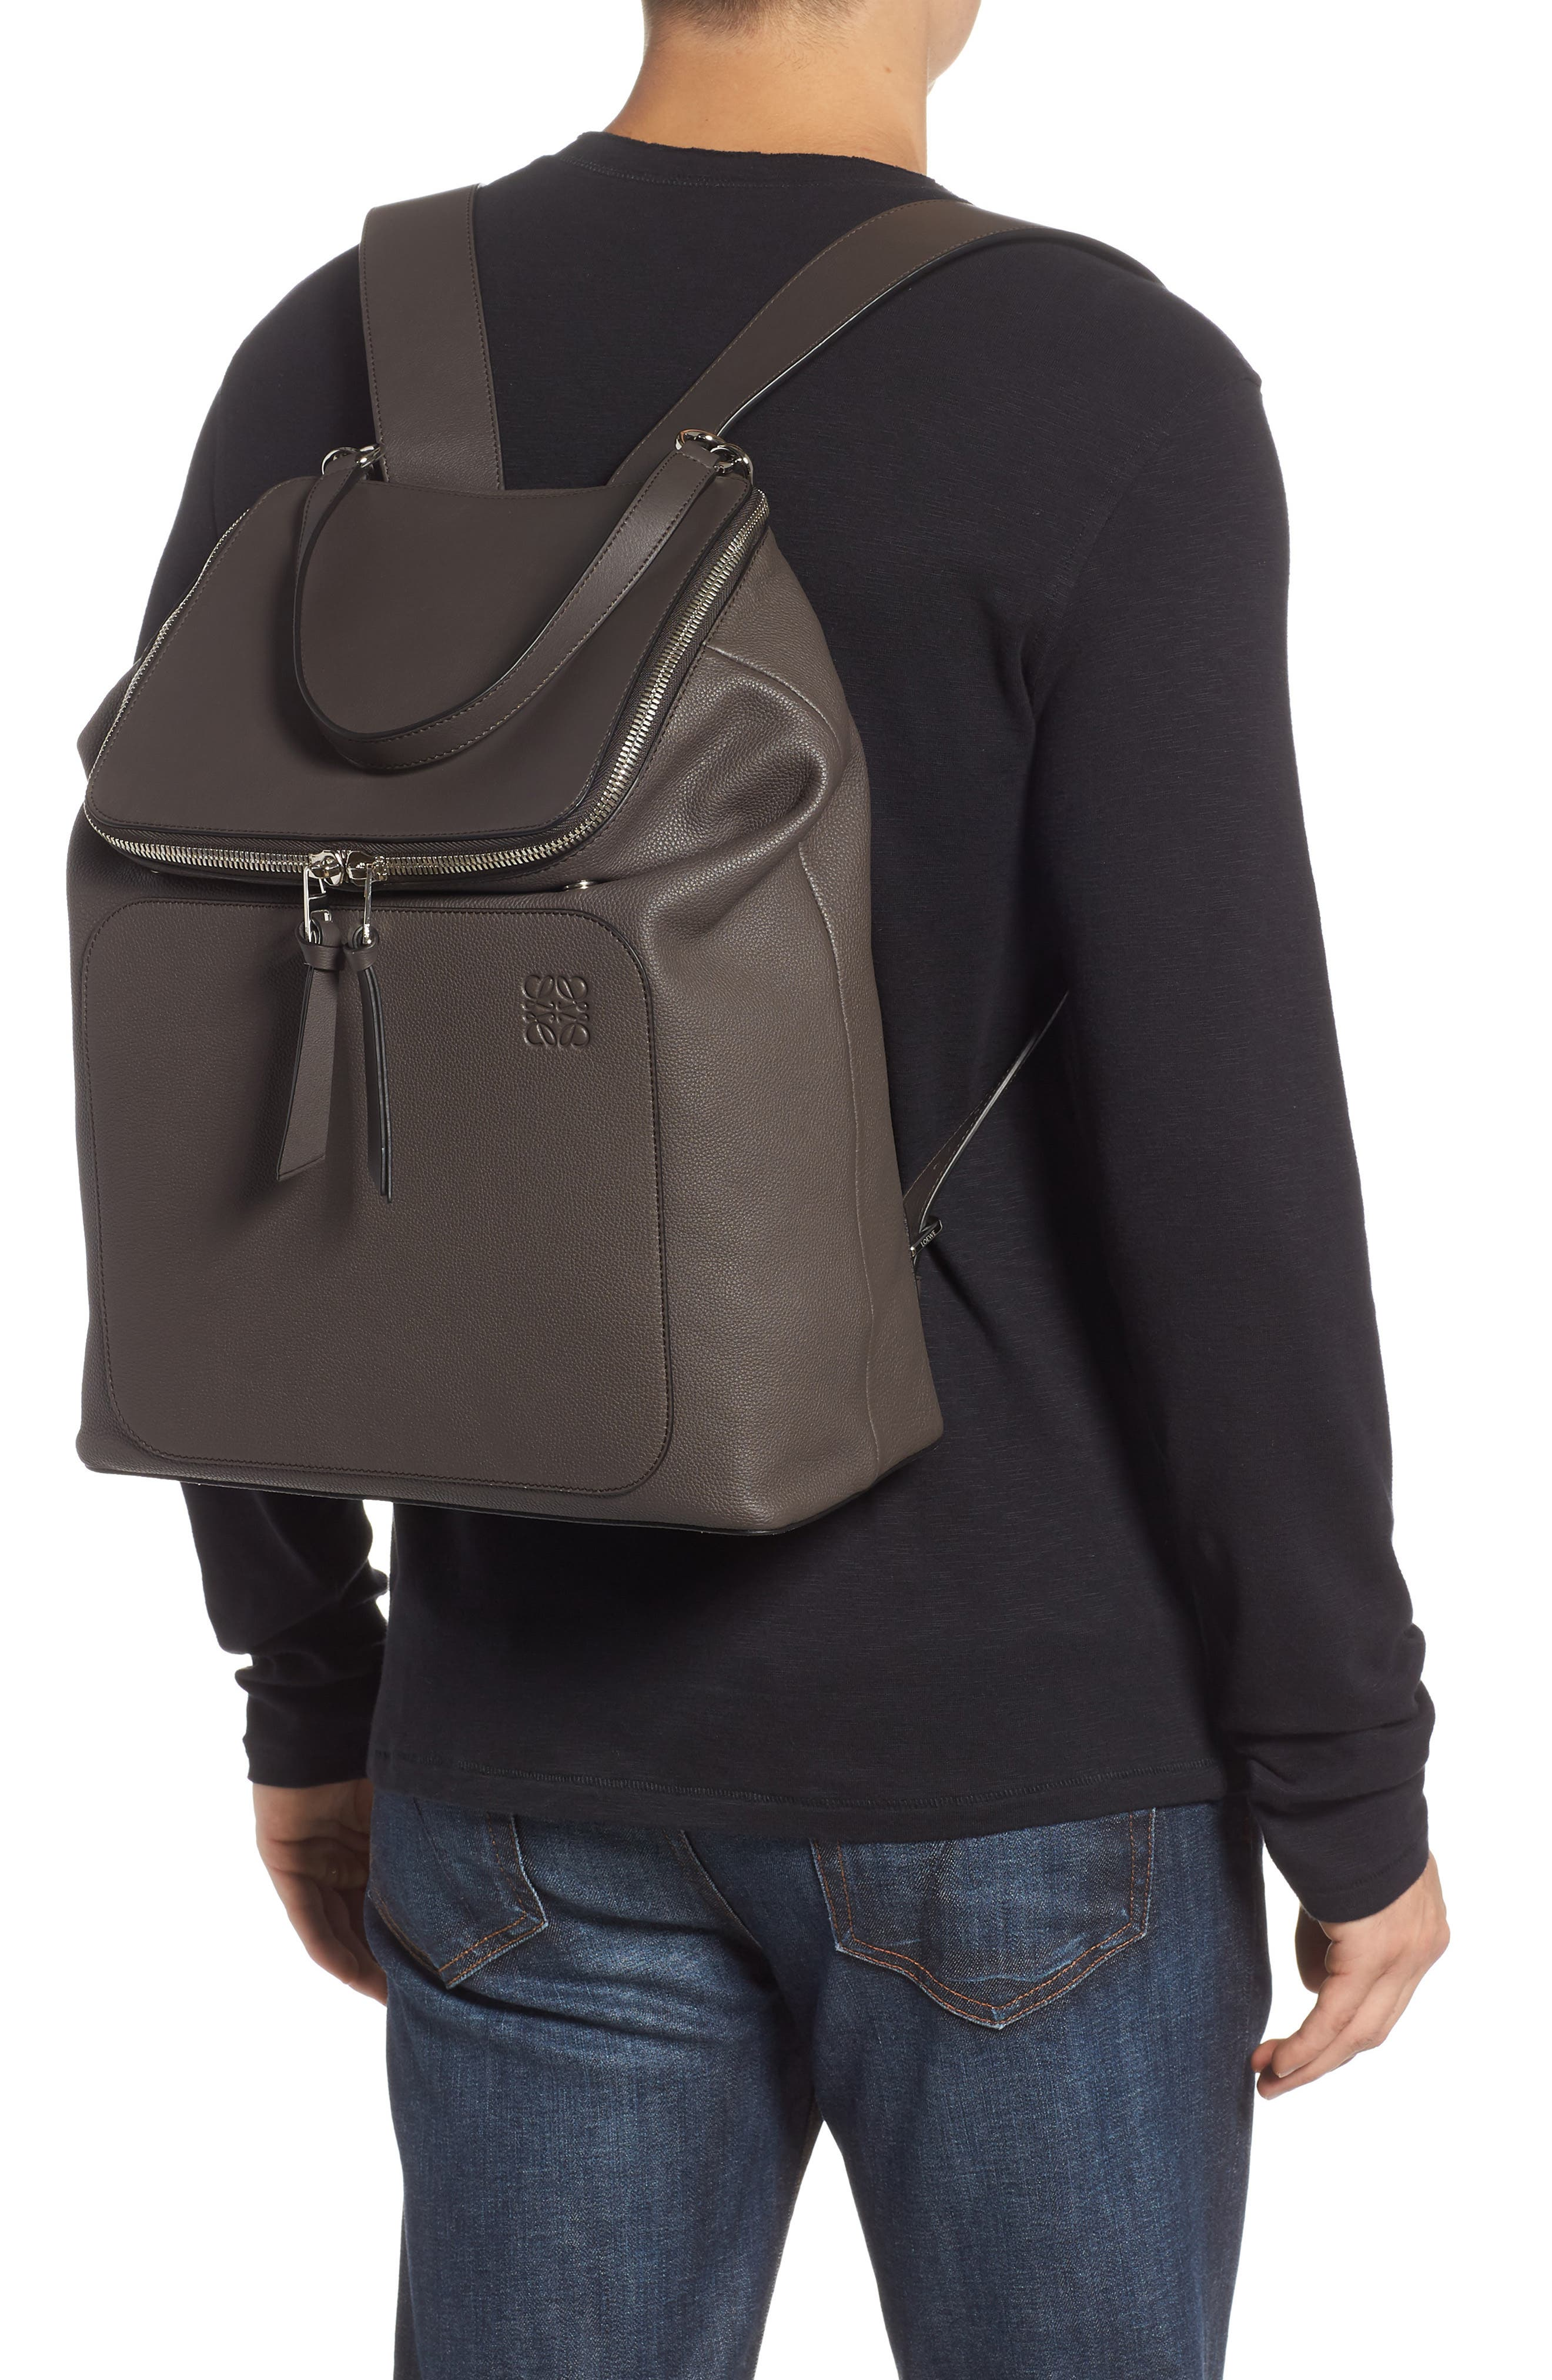 Goya Plaid Calfskin Leather Backpack,                             Alternate thumbnail 2, color,                             022